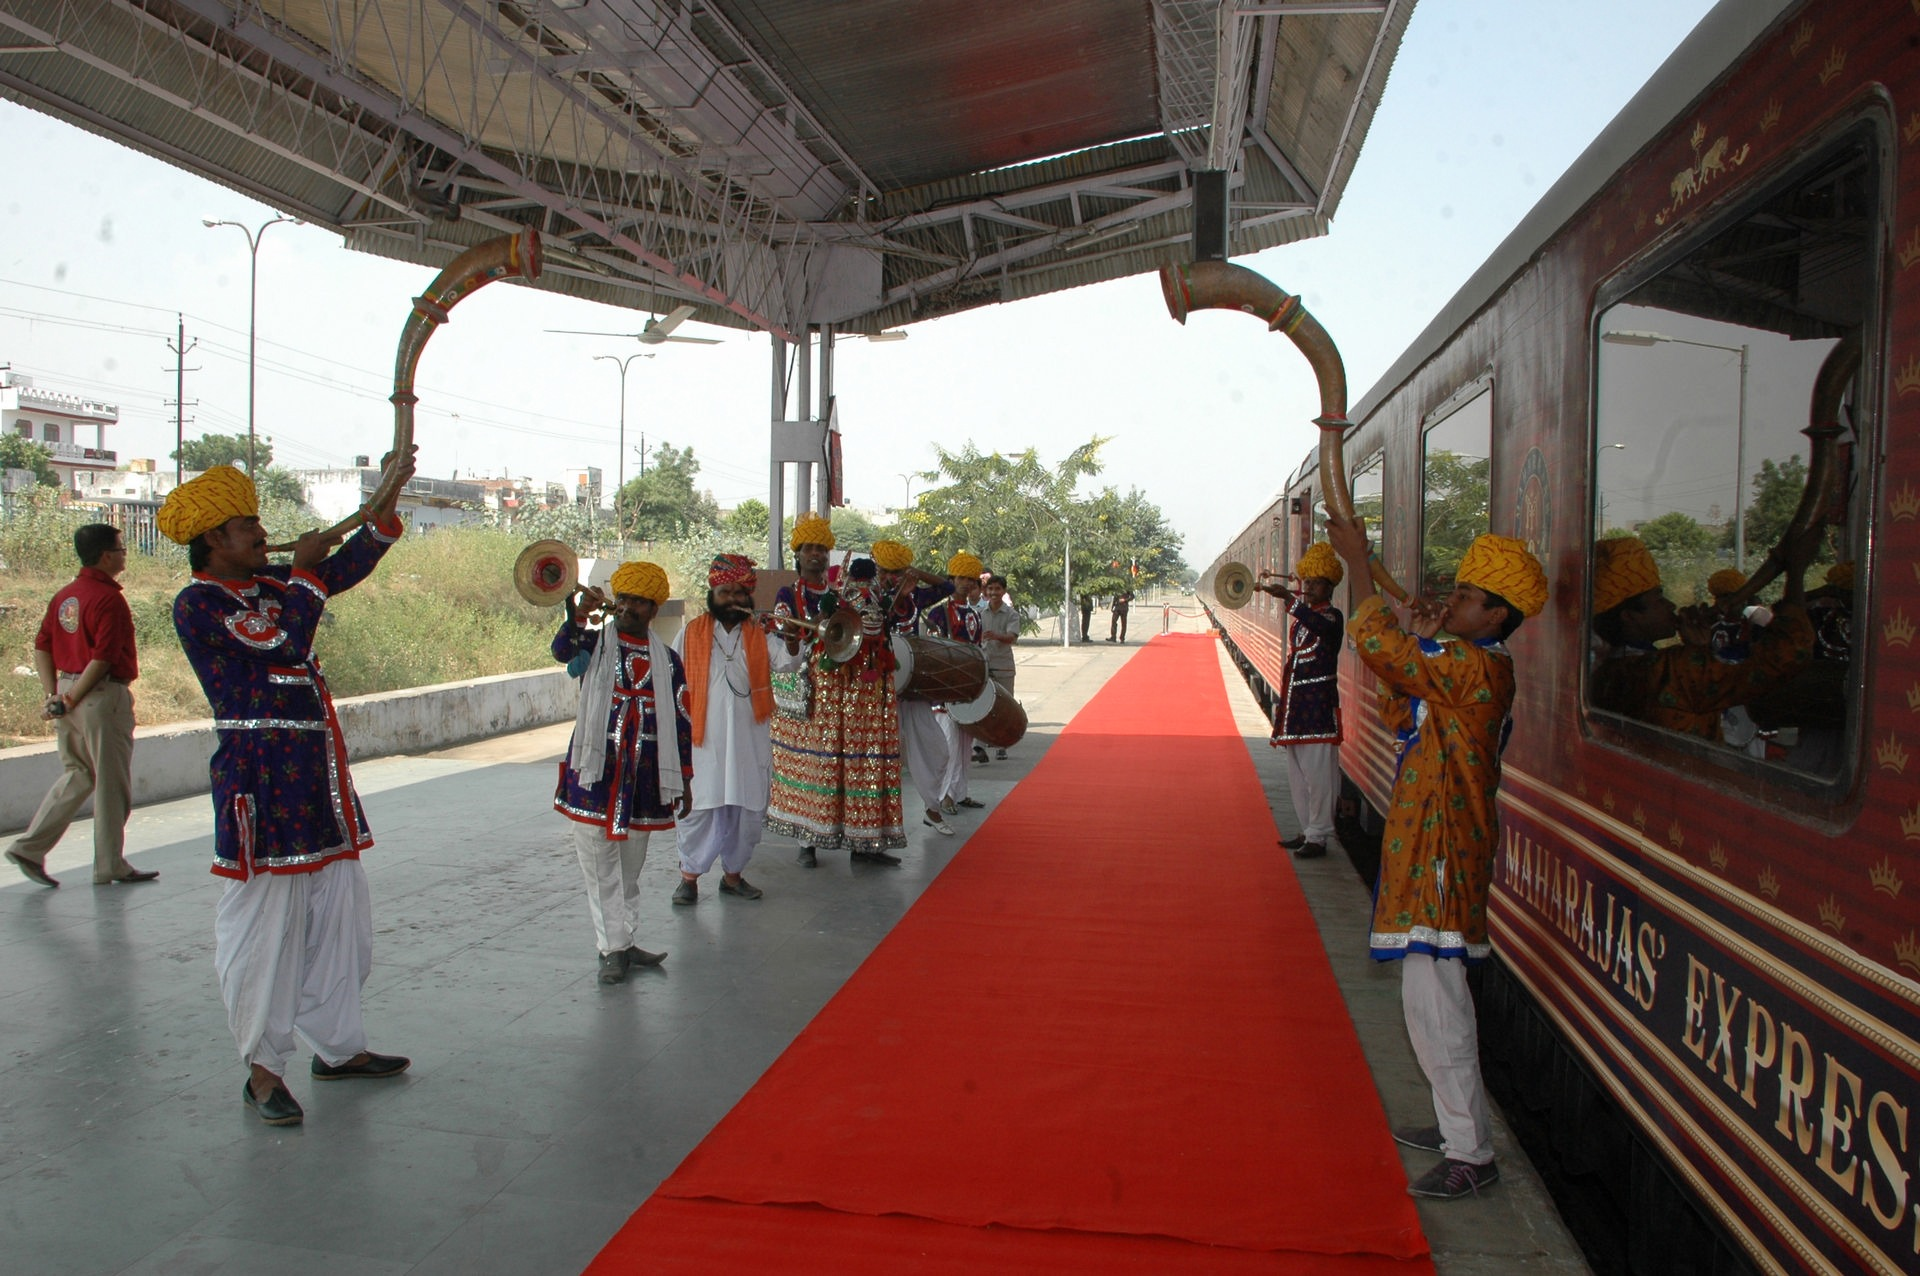 NOMAD-luksusowe-pociągi-Maharajas-Express-Indie-02